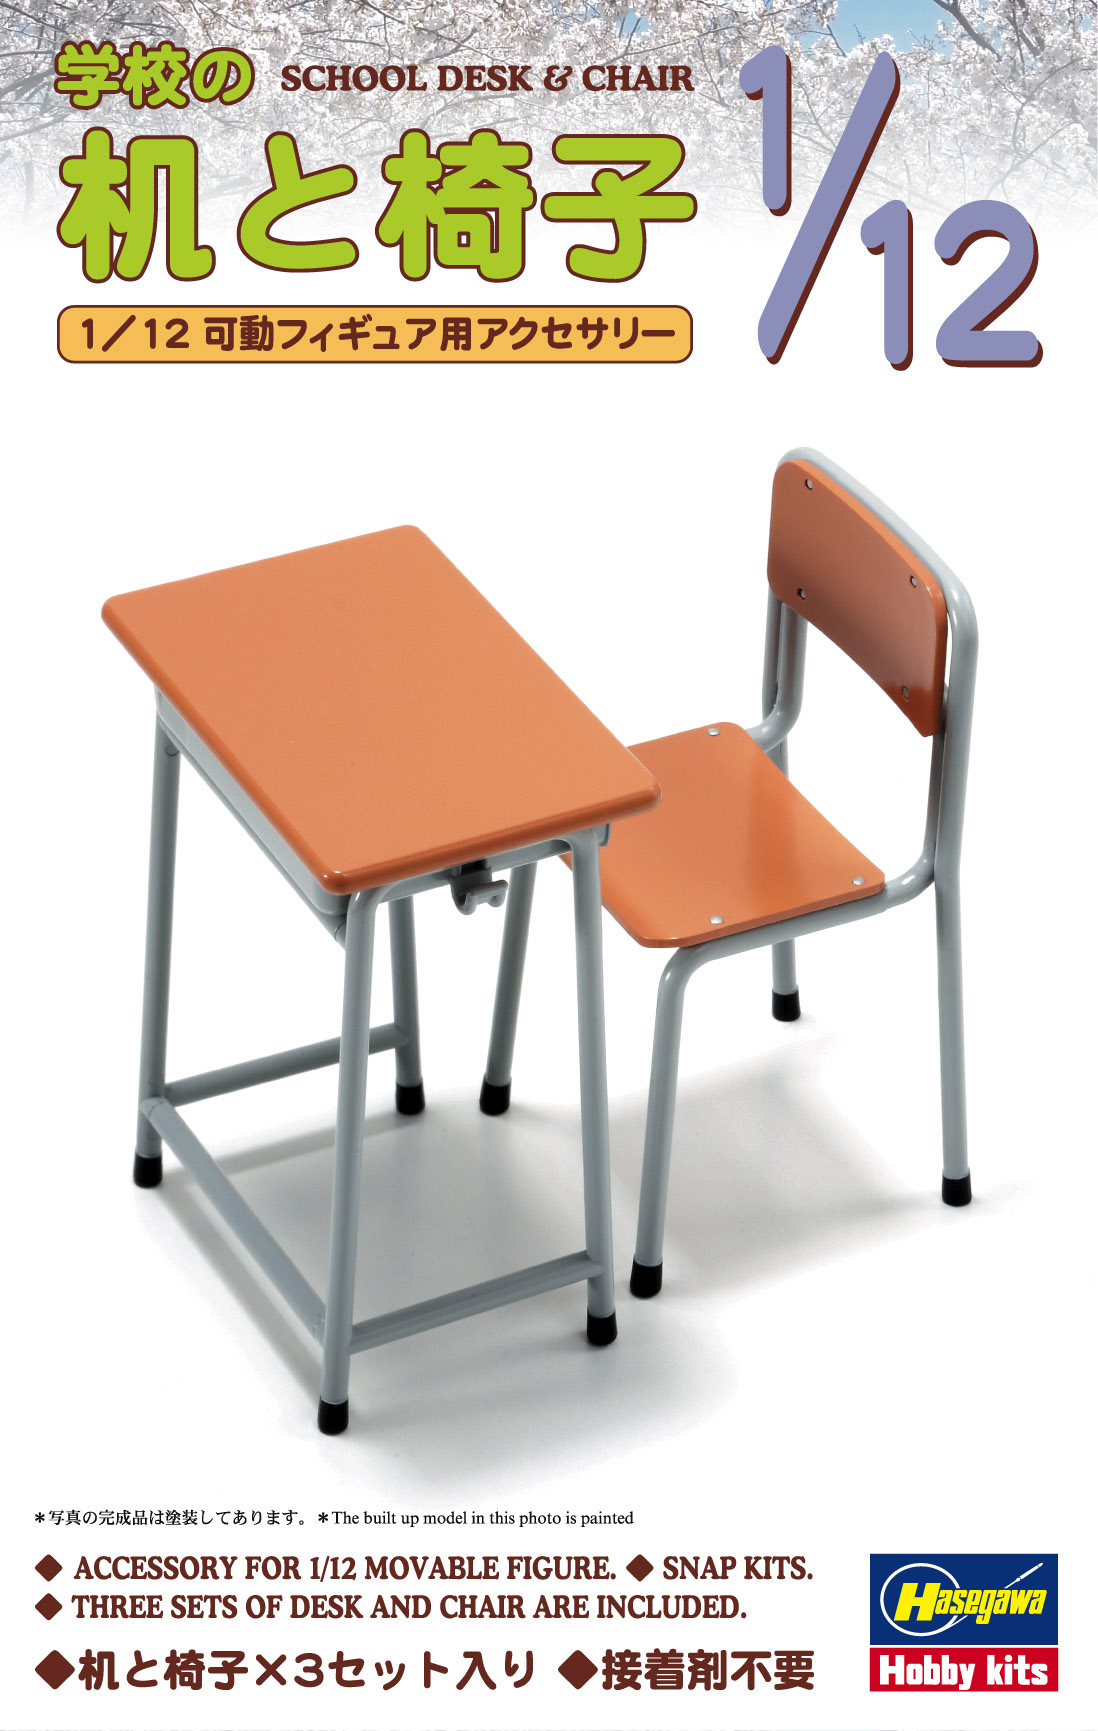 Hasegawa School Desk & Chair